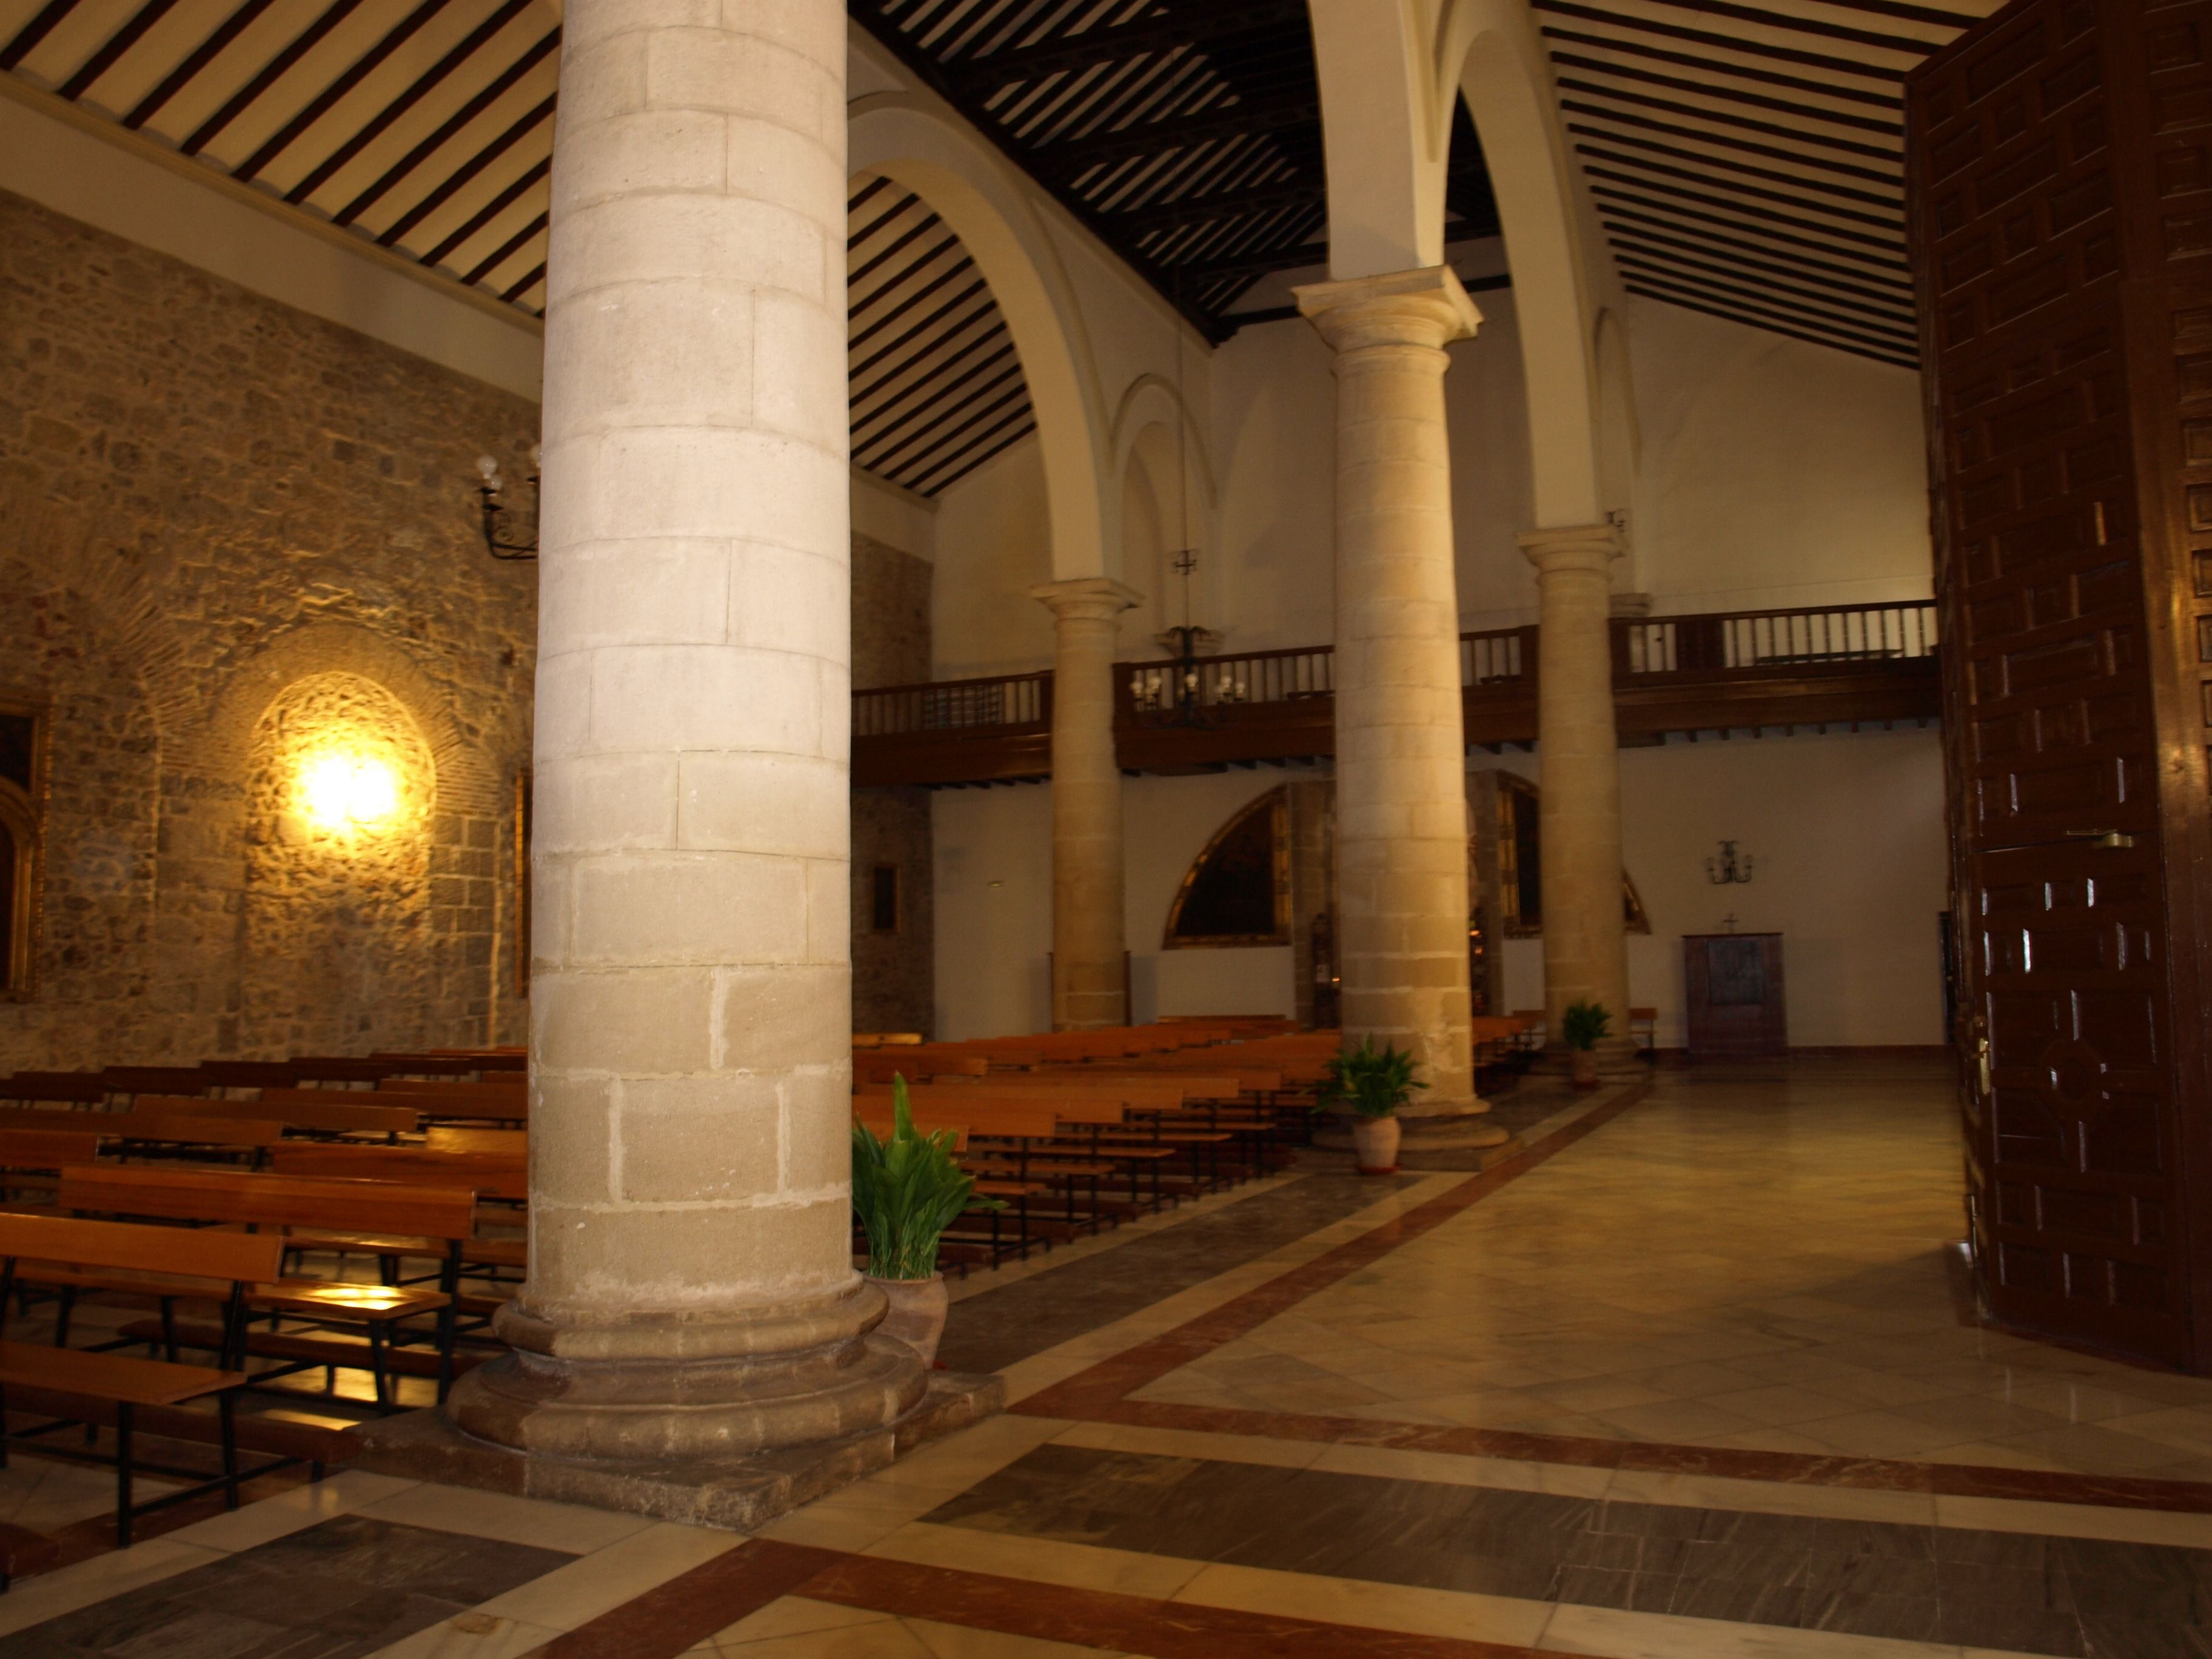 panoramica de la iglesia de Santa Marta